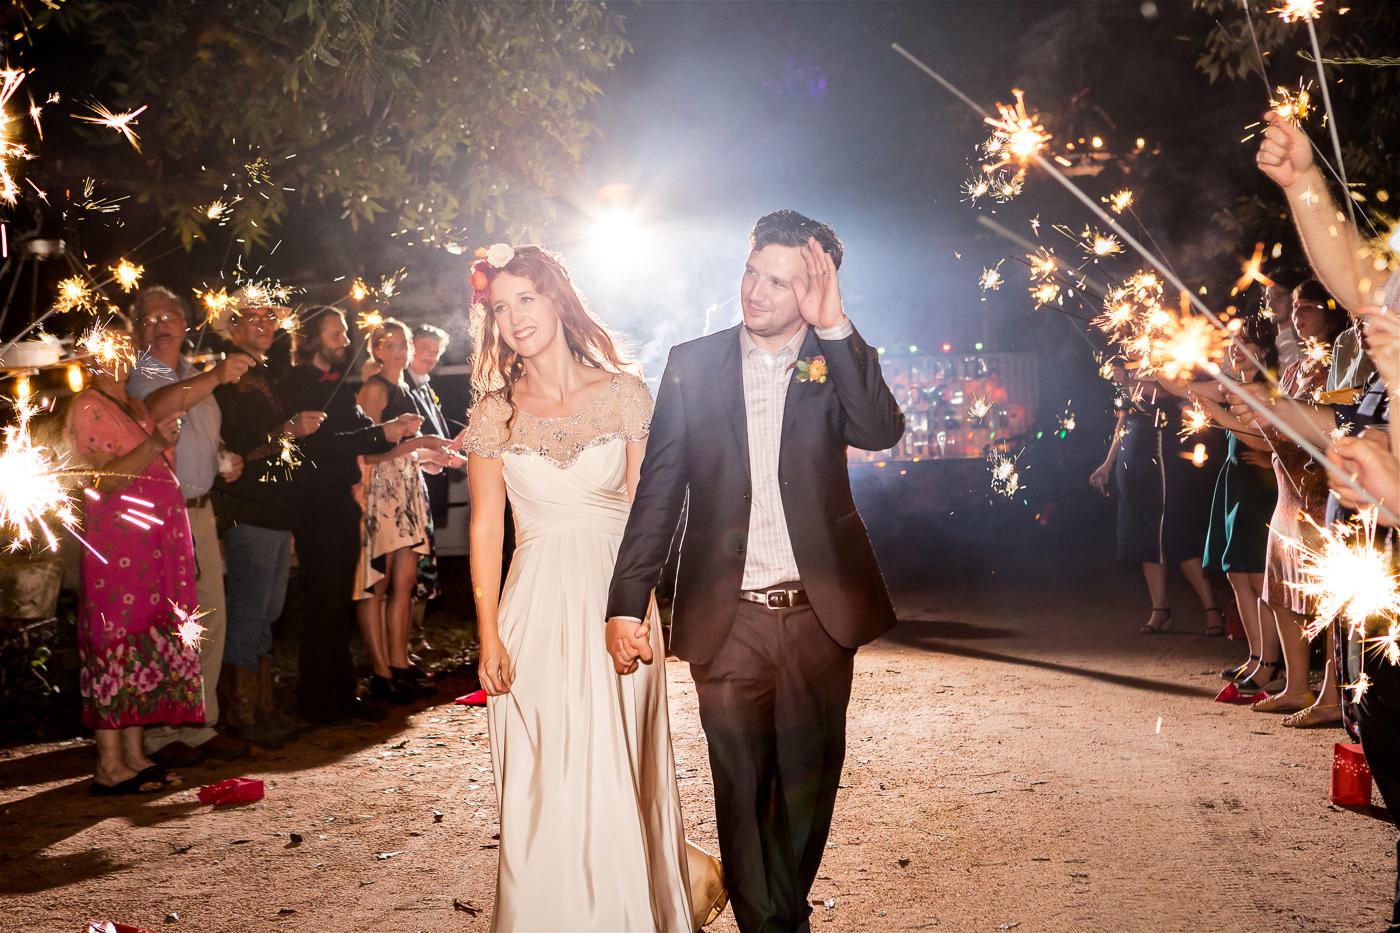 austin-wedding-photographer-videographer-010.jpg